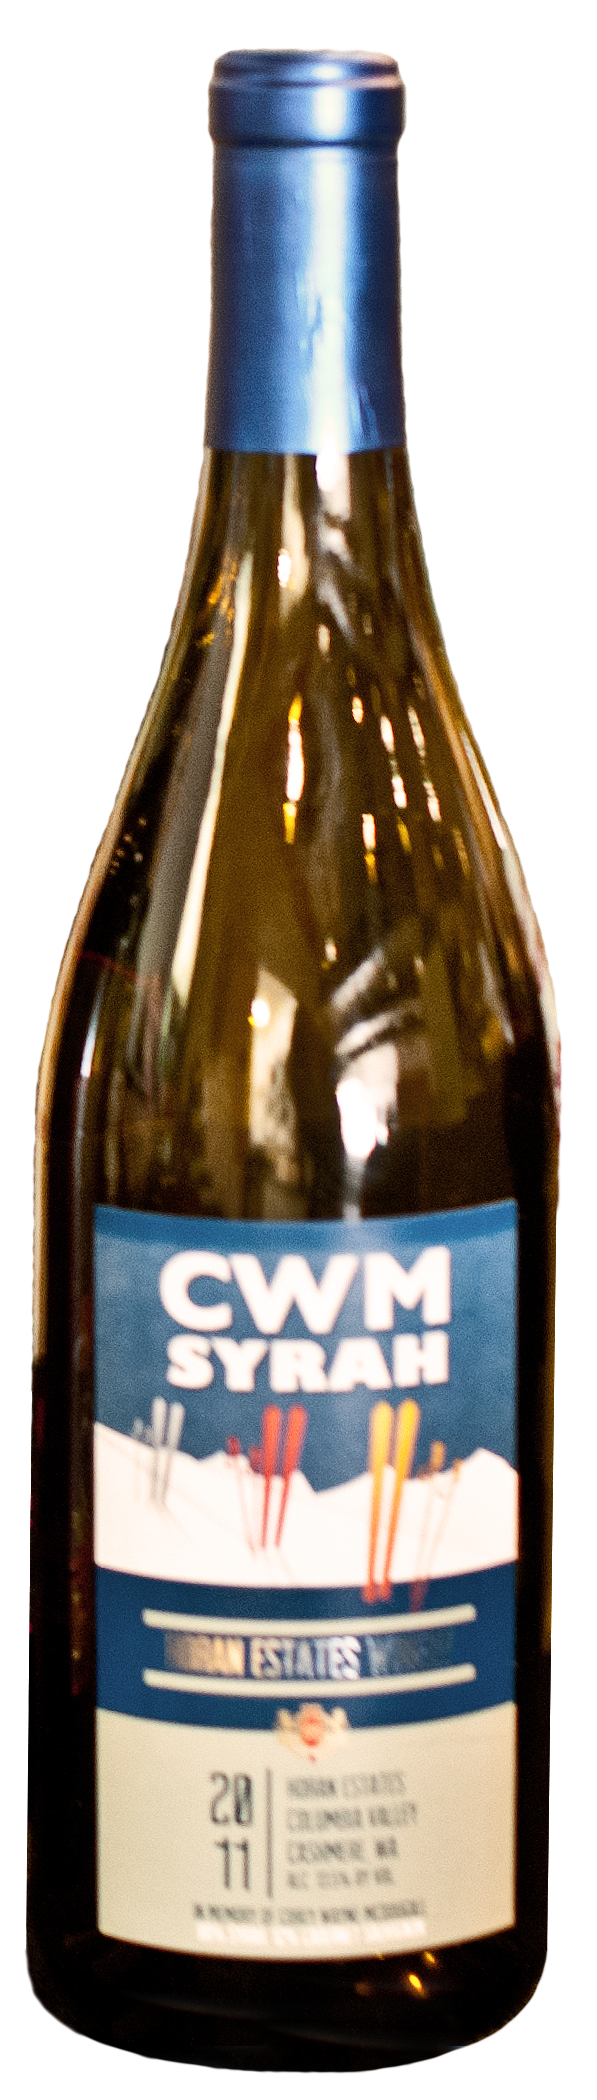 CWM-Syrah.png